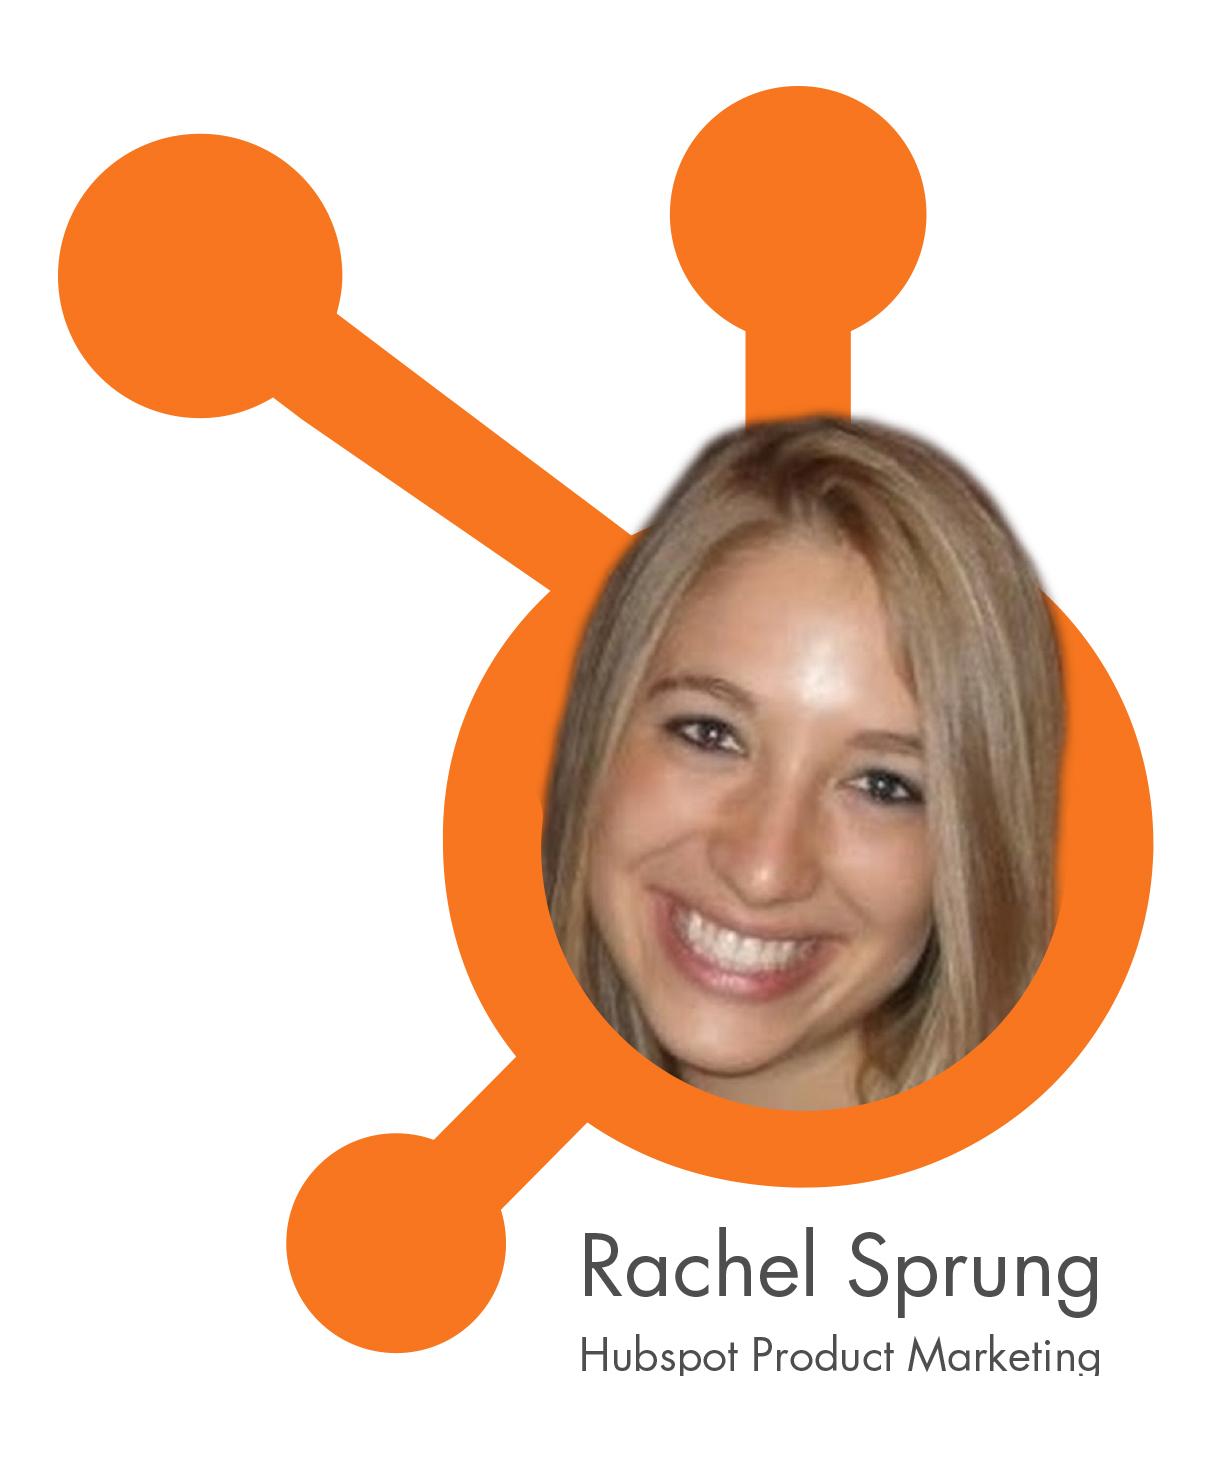 Rachel_Sprung_sprocket